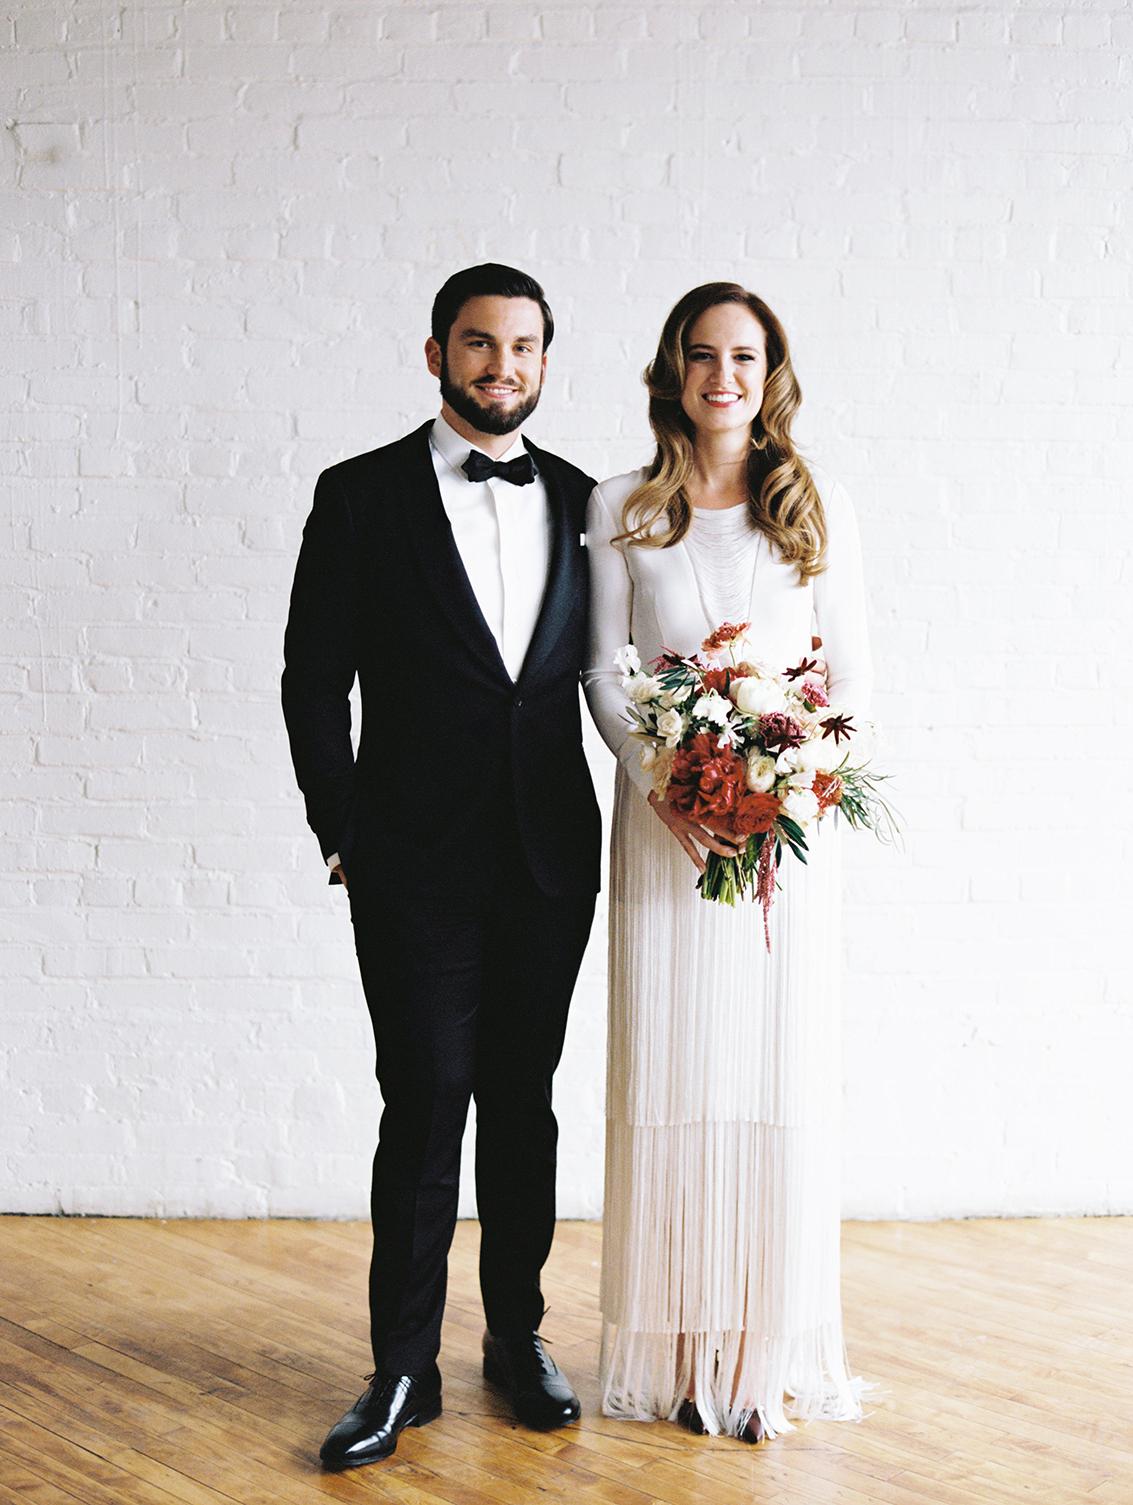 joanna jay wedding couple pose